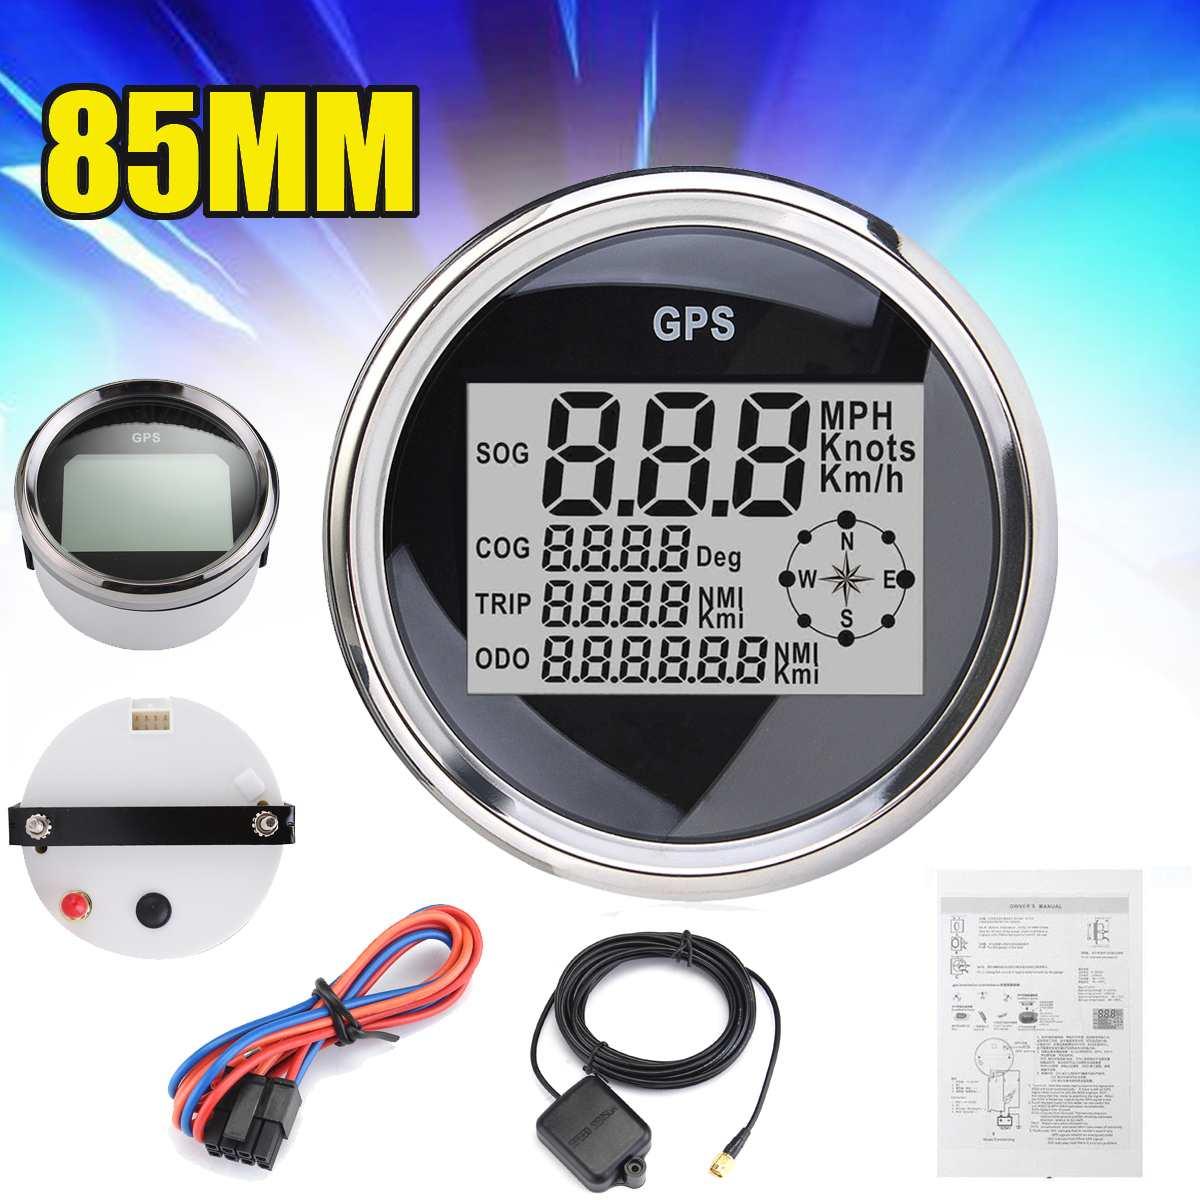 1Pcs GPS Digital Speedometer 85mm GPS Waterproof  Digital Speedometer Odometer Gauge-in Speedometers from Automobiles & Motorcycles    1